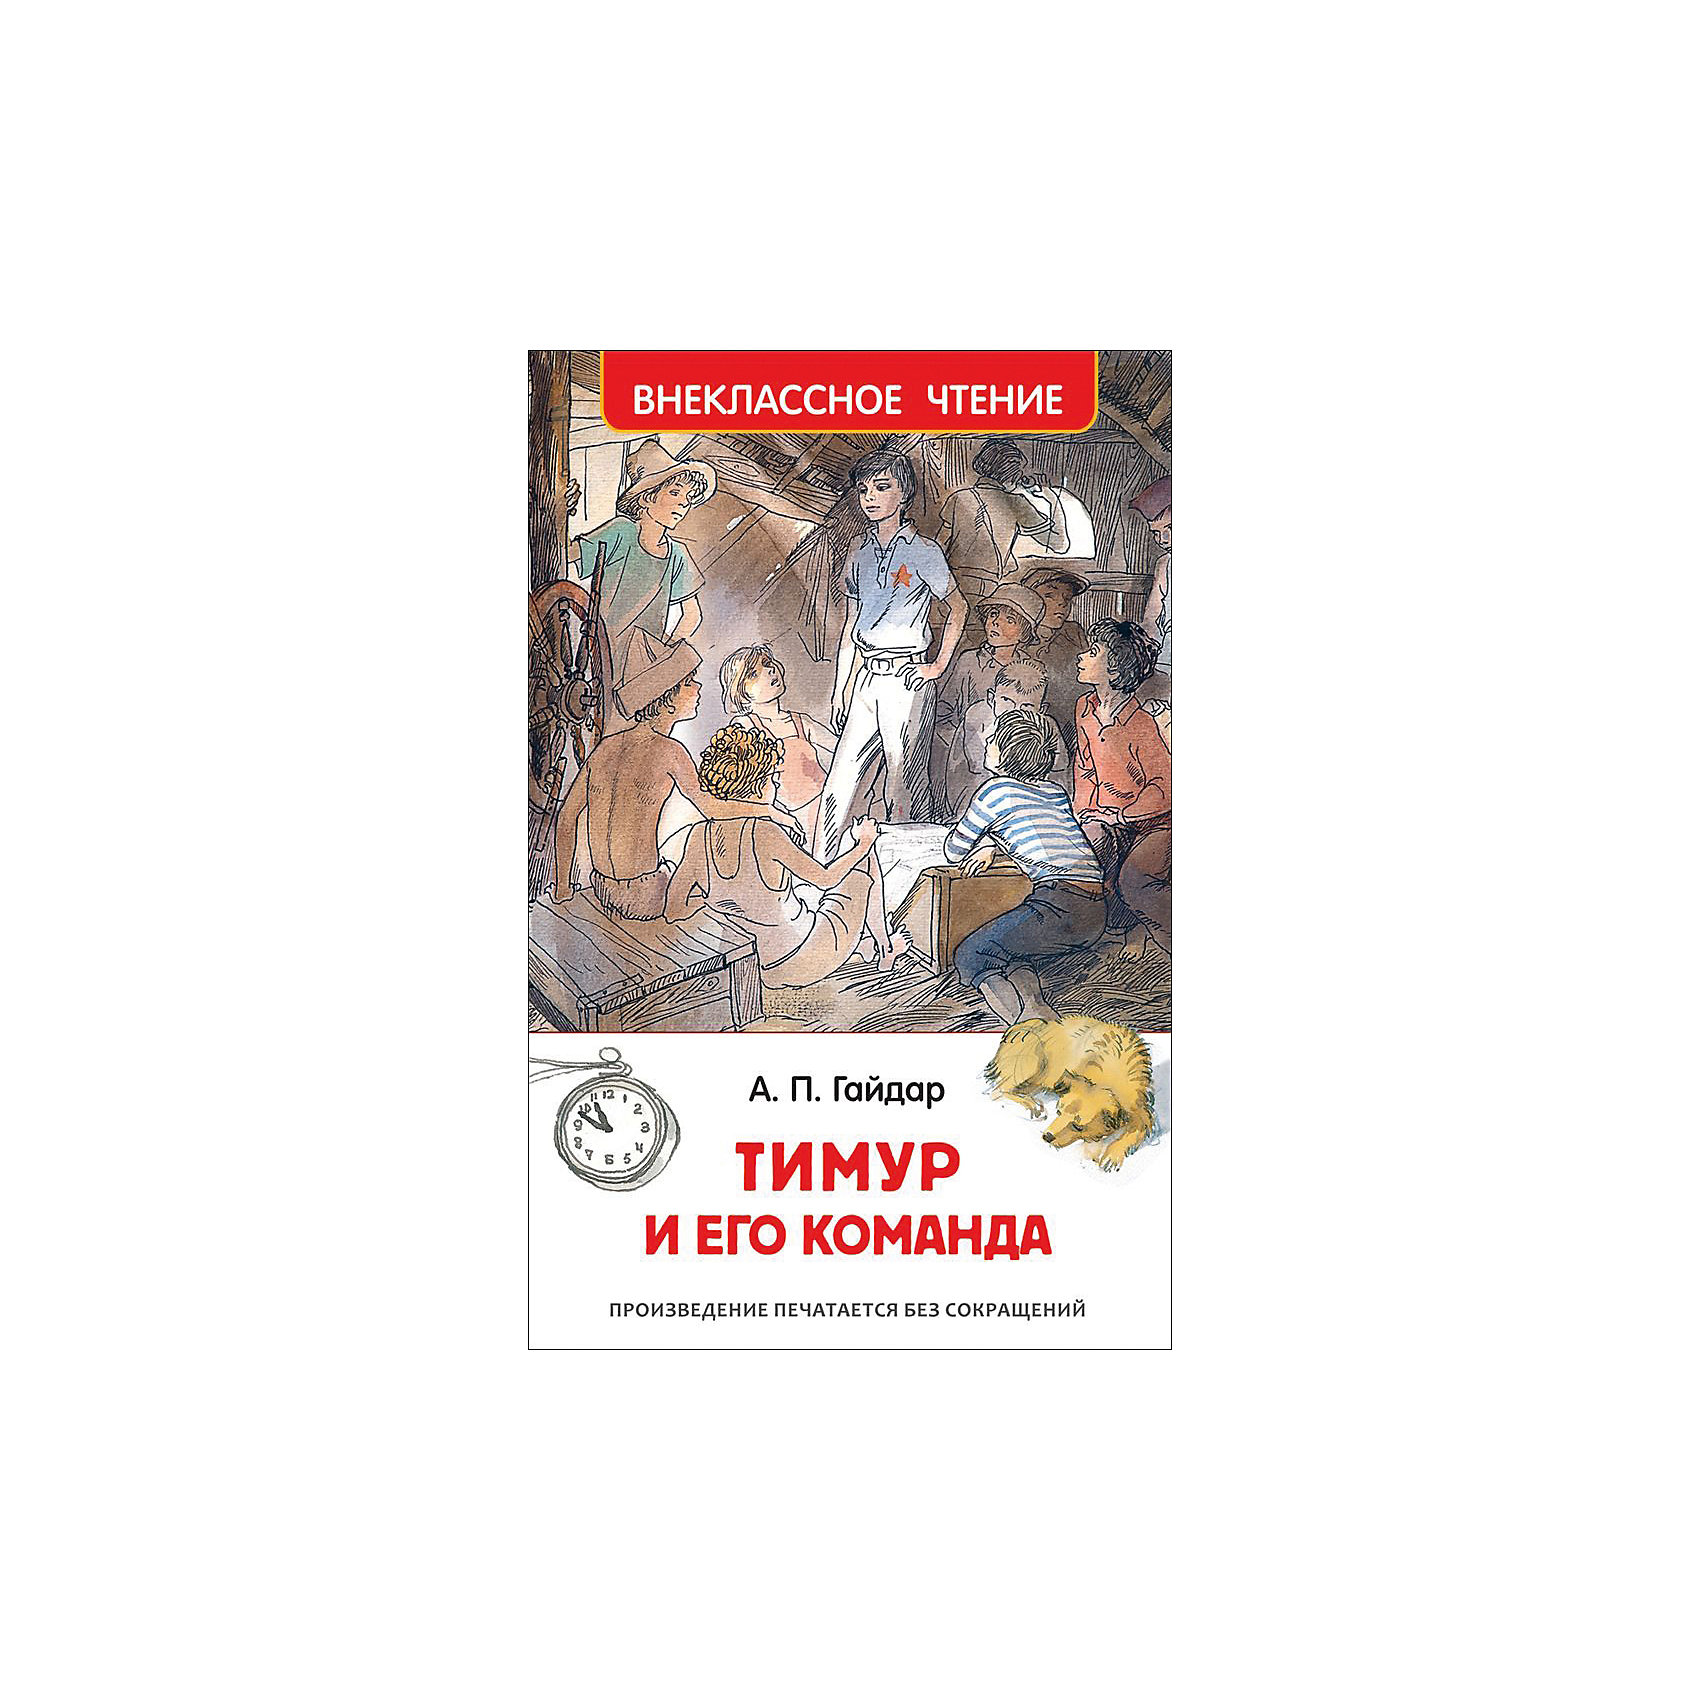 Росмэн Тимур и его команда, А. Гайдар аркадий гайдар тимур и его команда